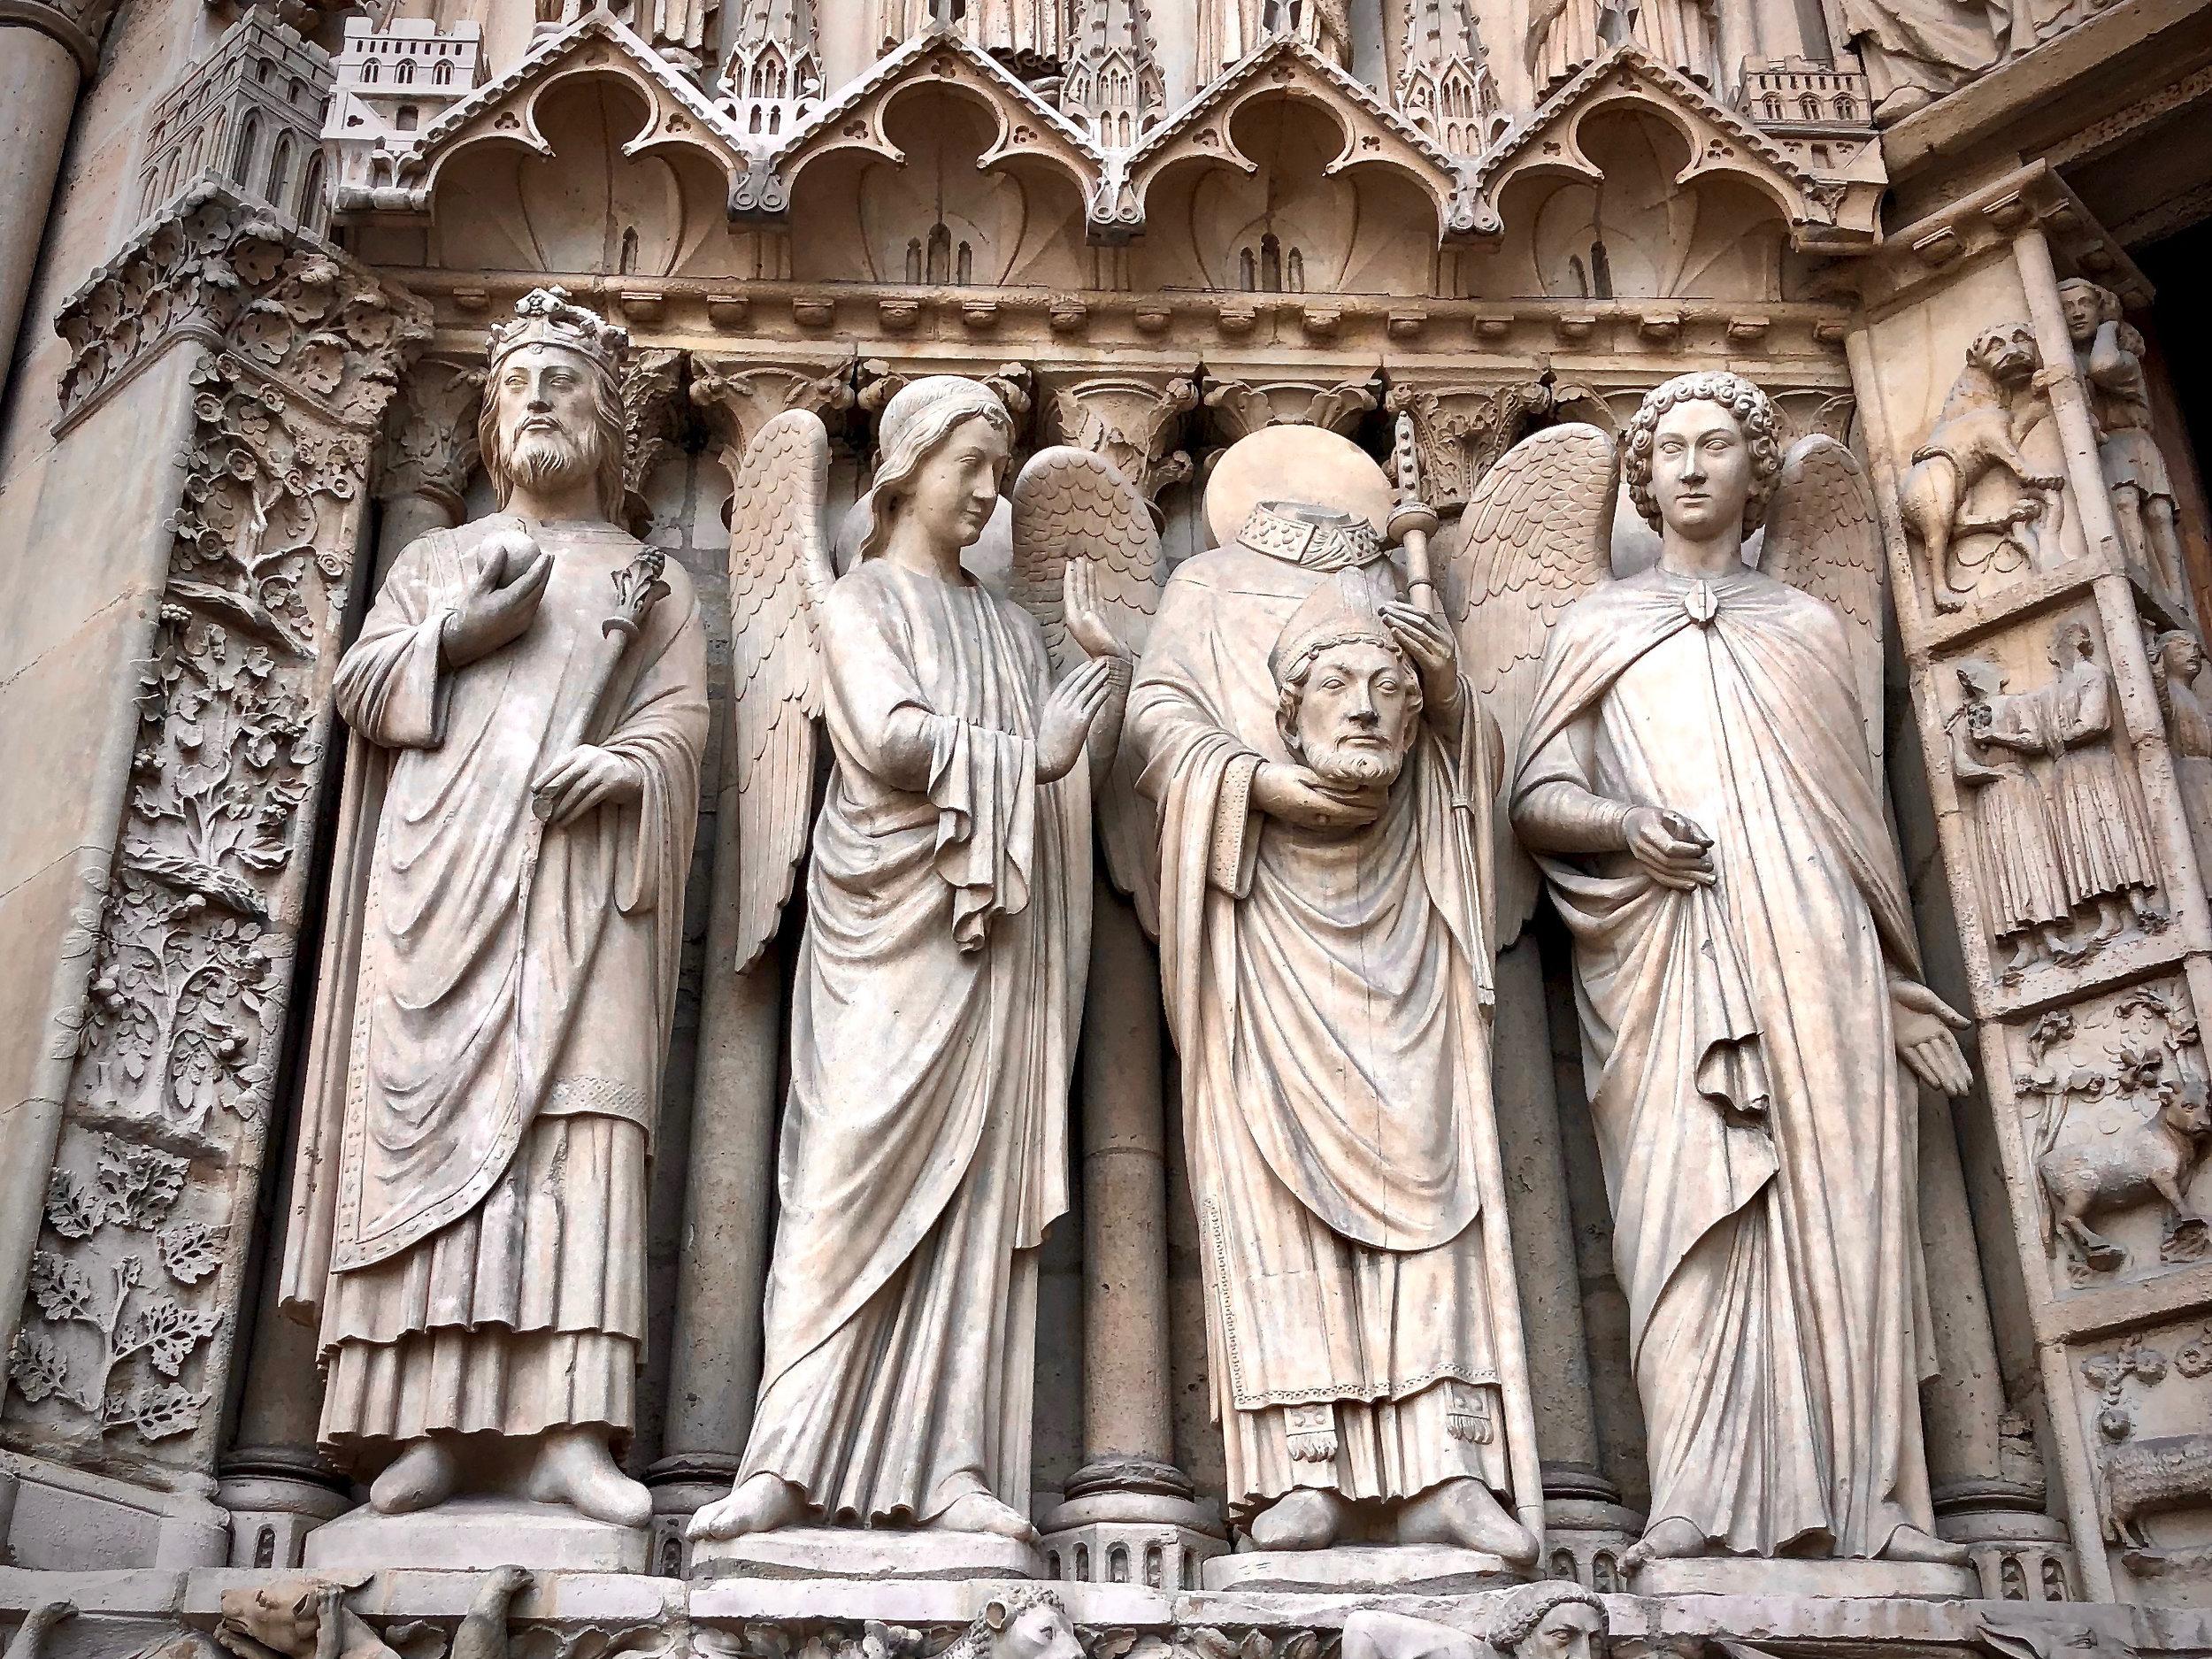 Exterior relief of Notre Dame